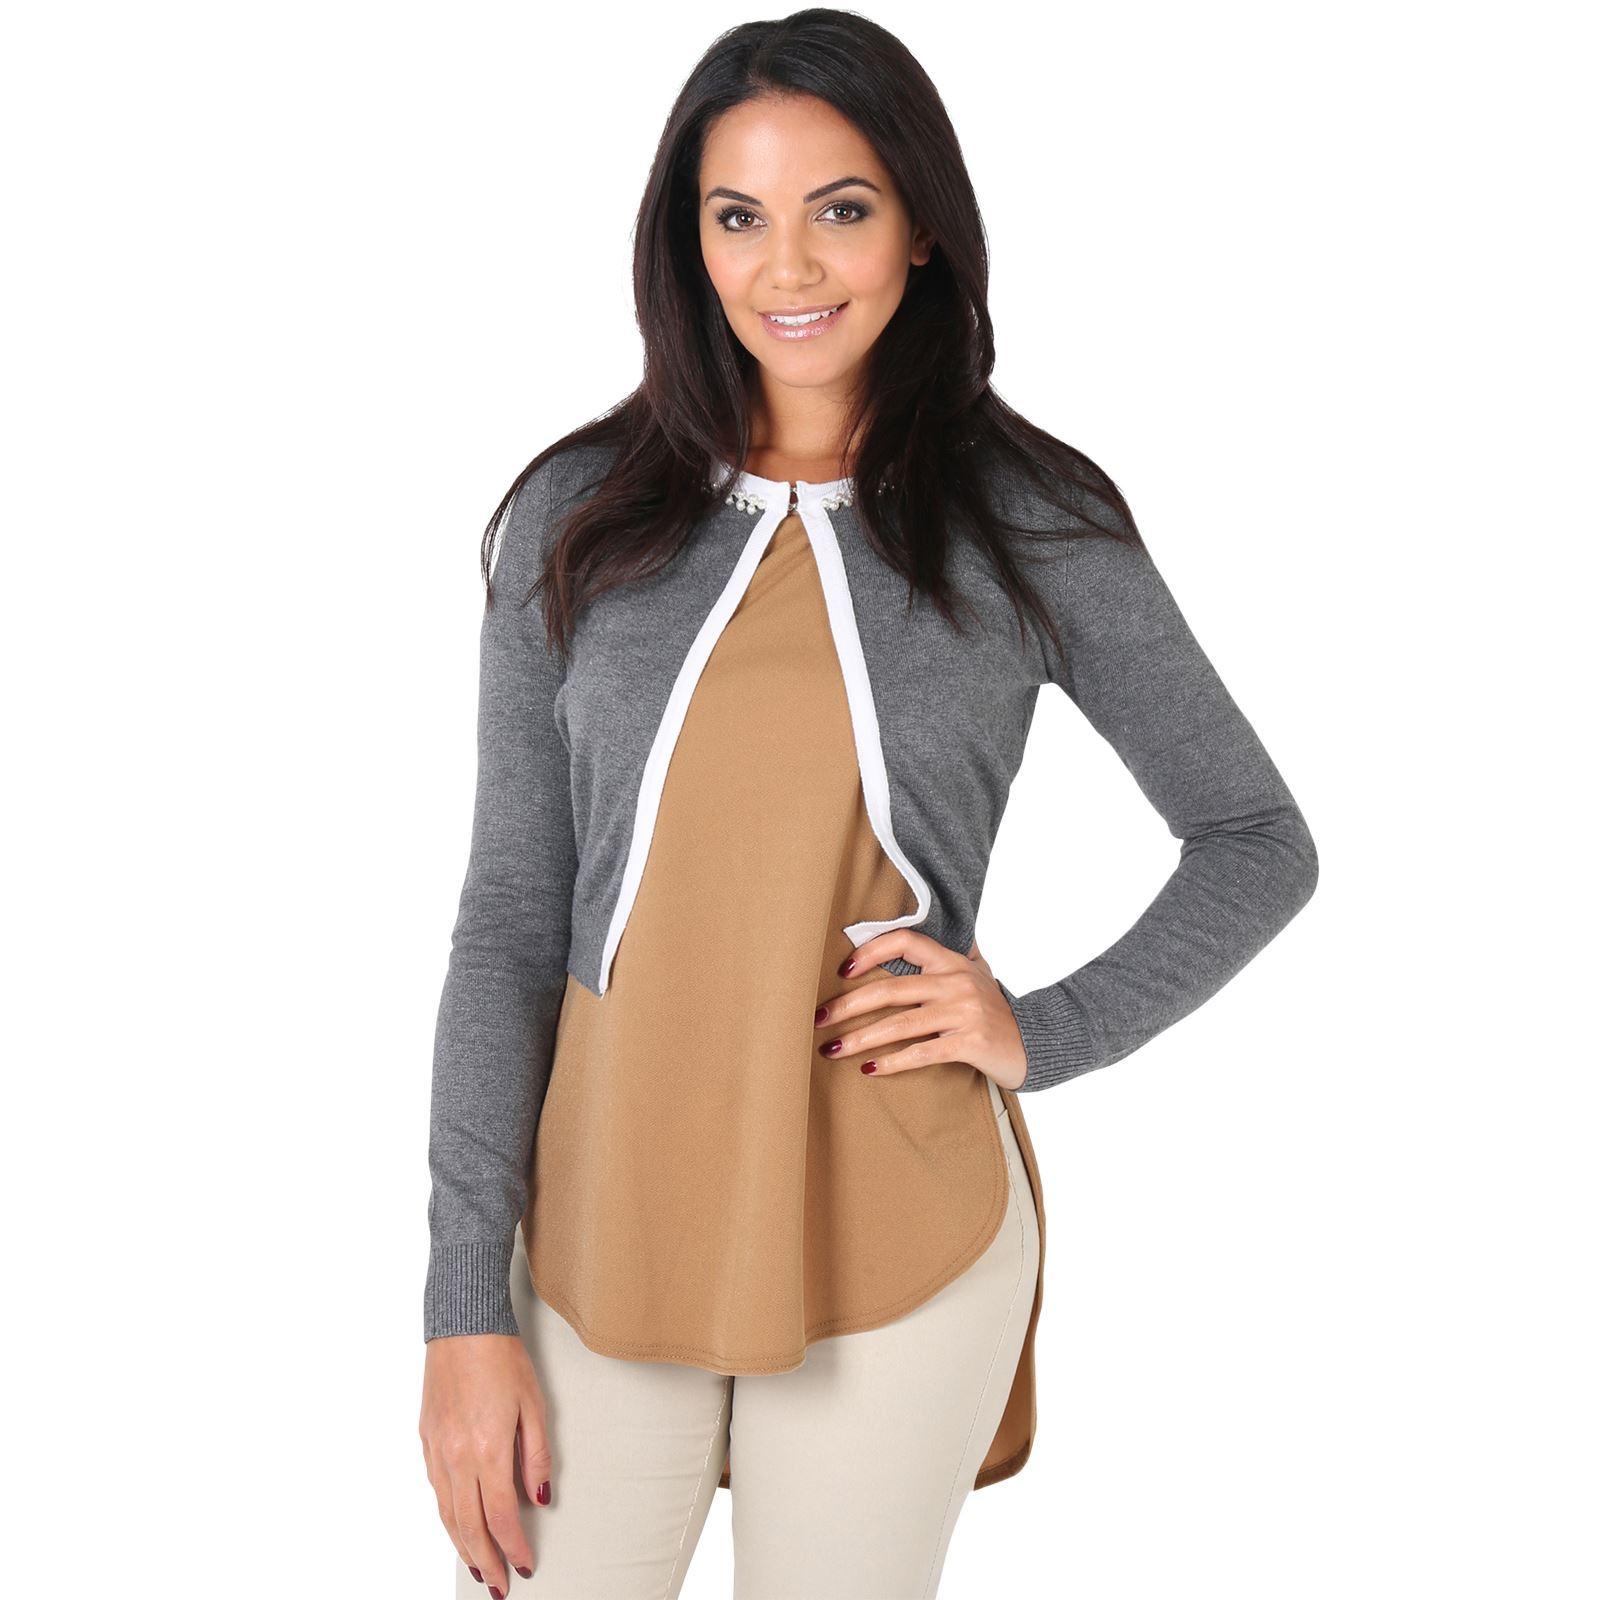 Womens-Ladies-Bolero-Shrug-Silky-Soft-Cardigan-Long-Sleeve-Knit-Short-Top-Work thumbnail 13